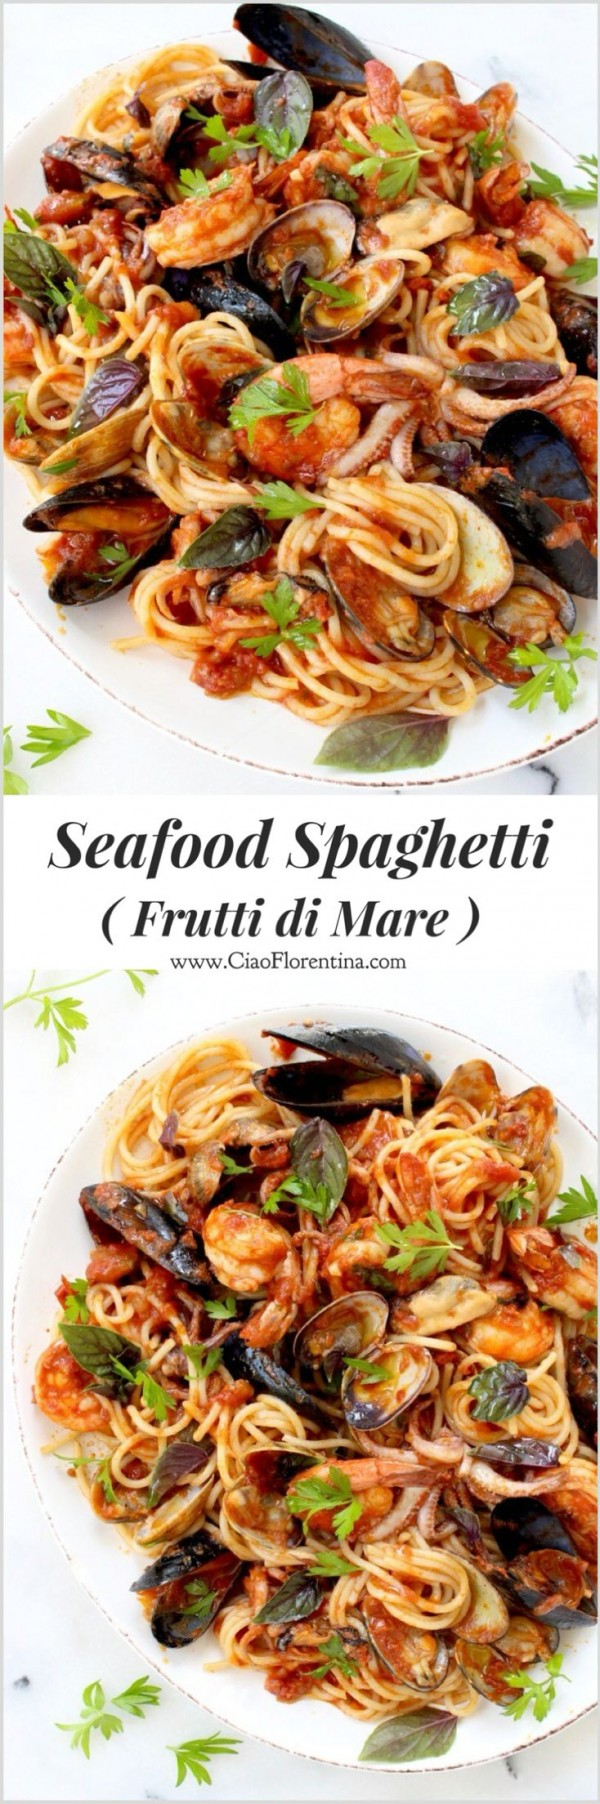 Get the recipe Seafood Spaghetti @recipes_to_go